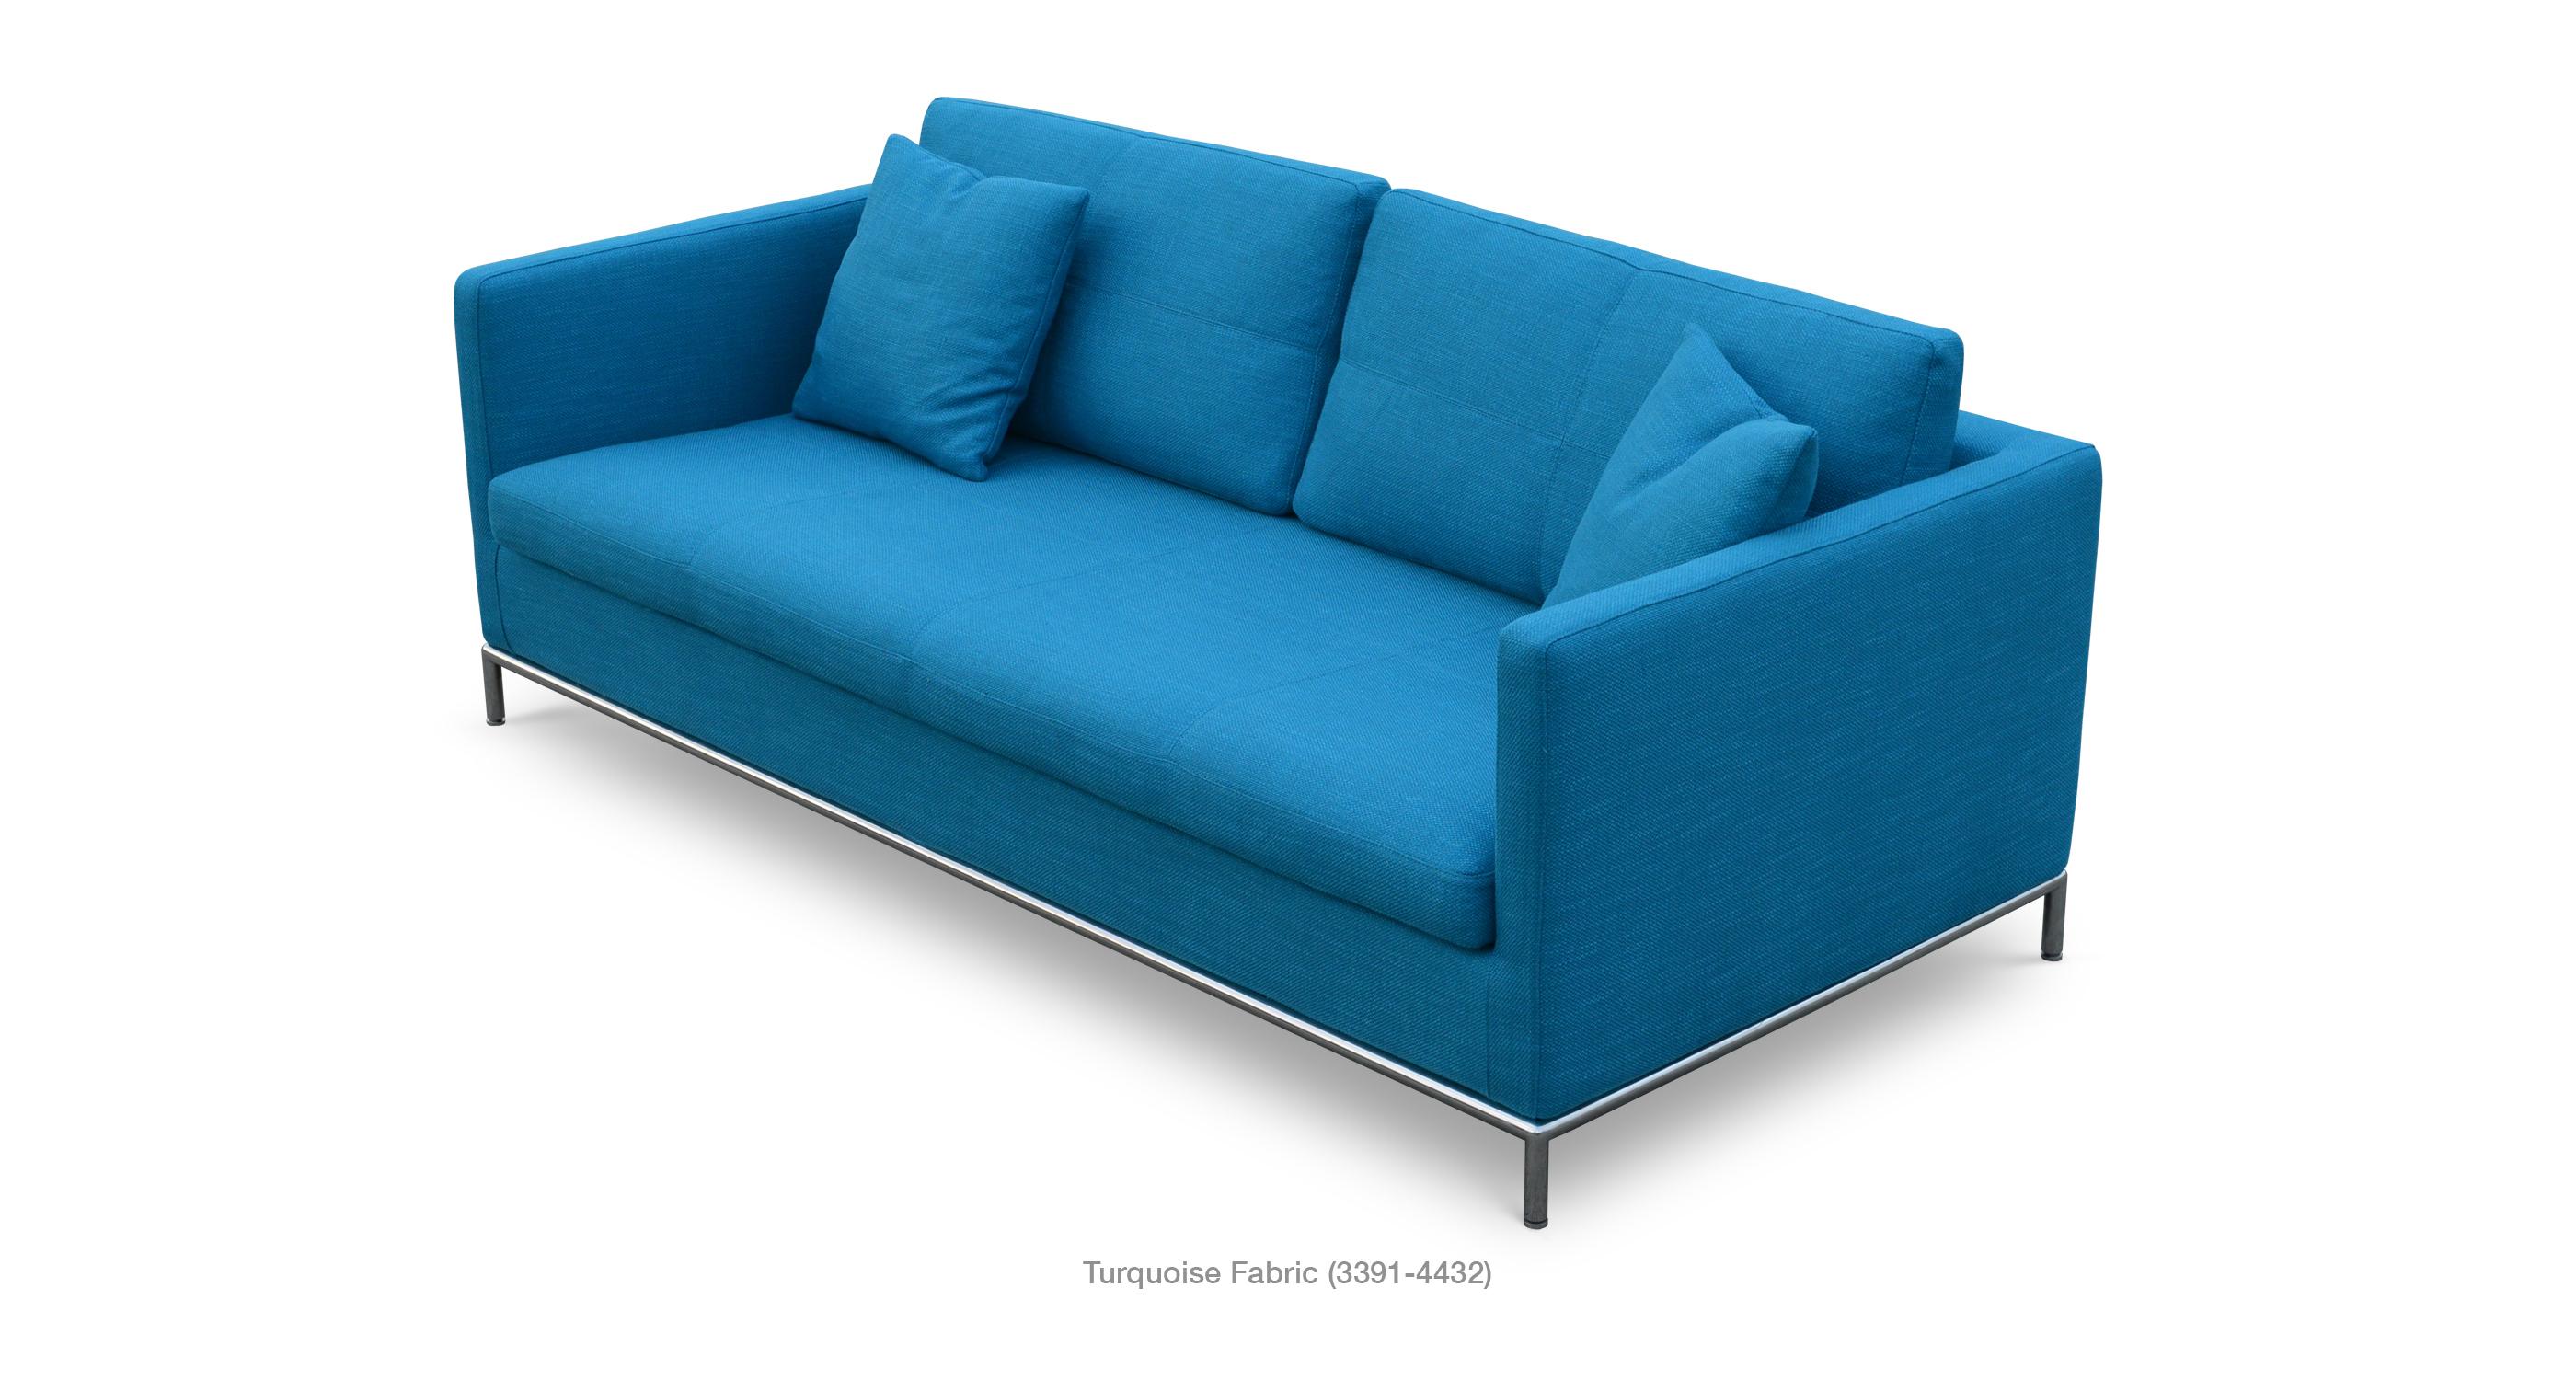 Istanbul Sofa Turquoise Fabric